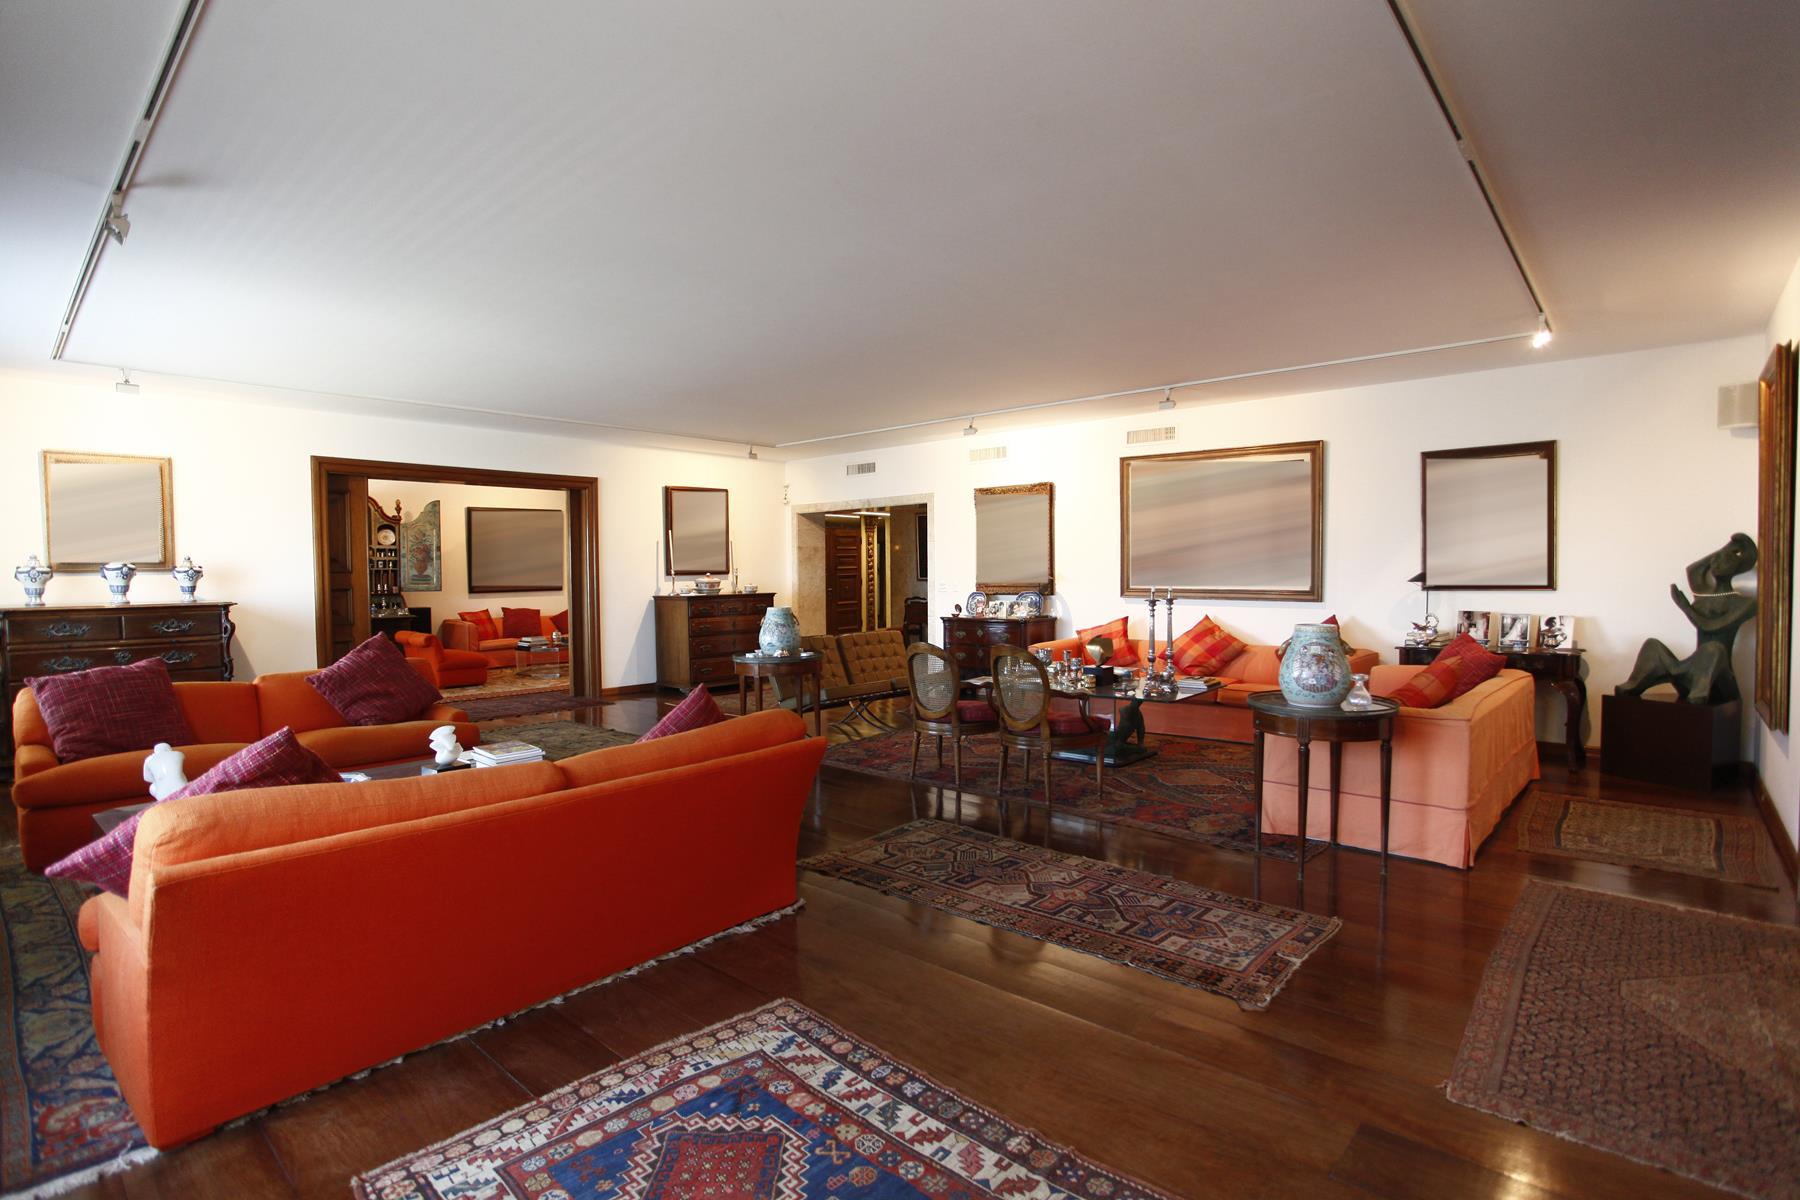 apartments for Sale at Apartment with sea view Rio de Janeiro, Rio de Janeiro Brazil